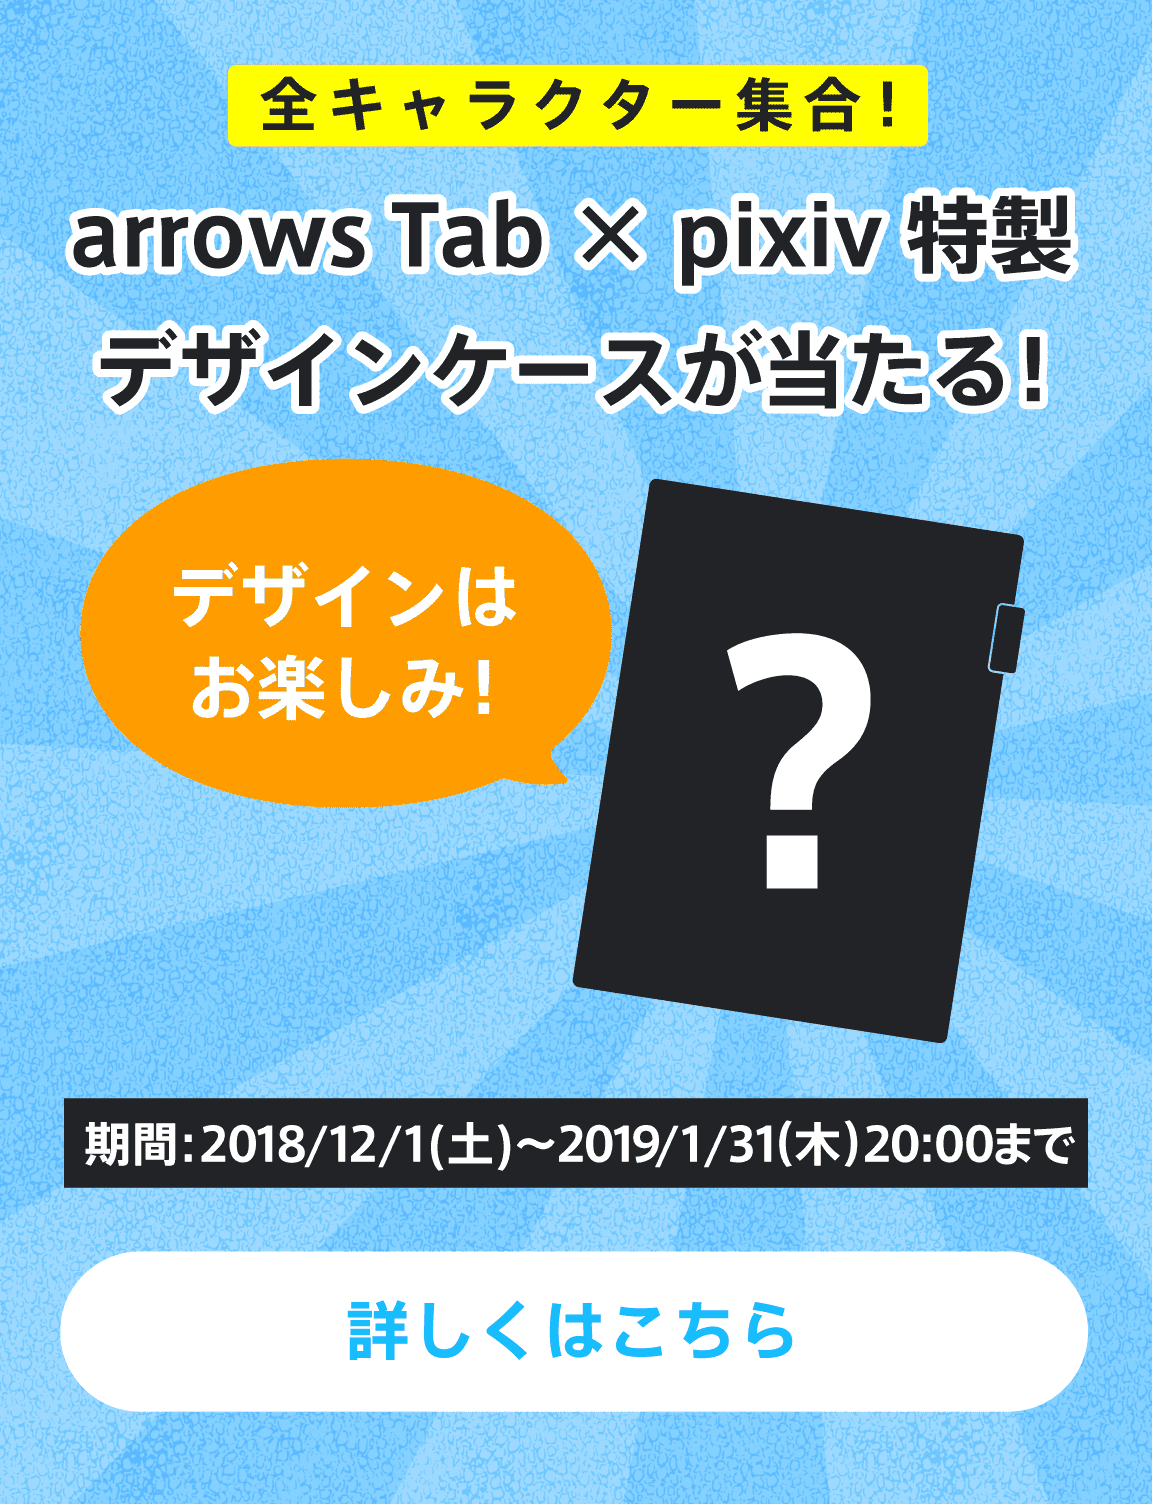 arrows Tab x pixiv特製デザインケースが当たる!